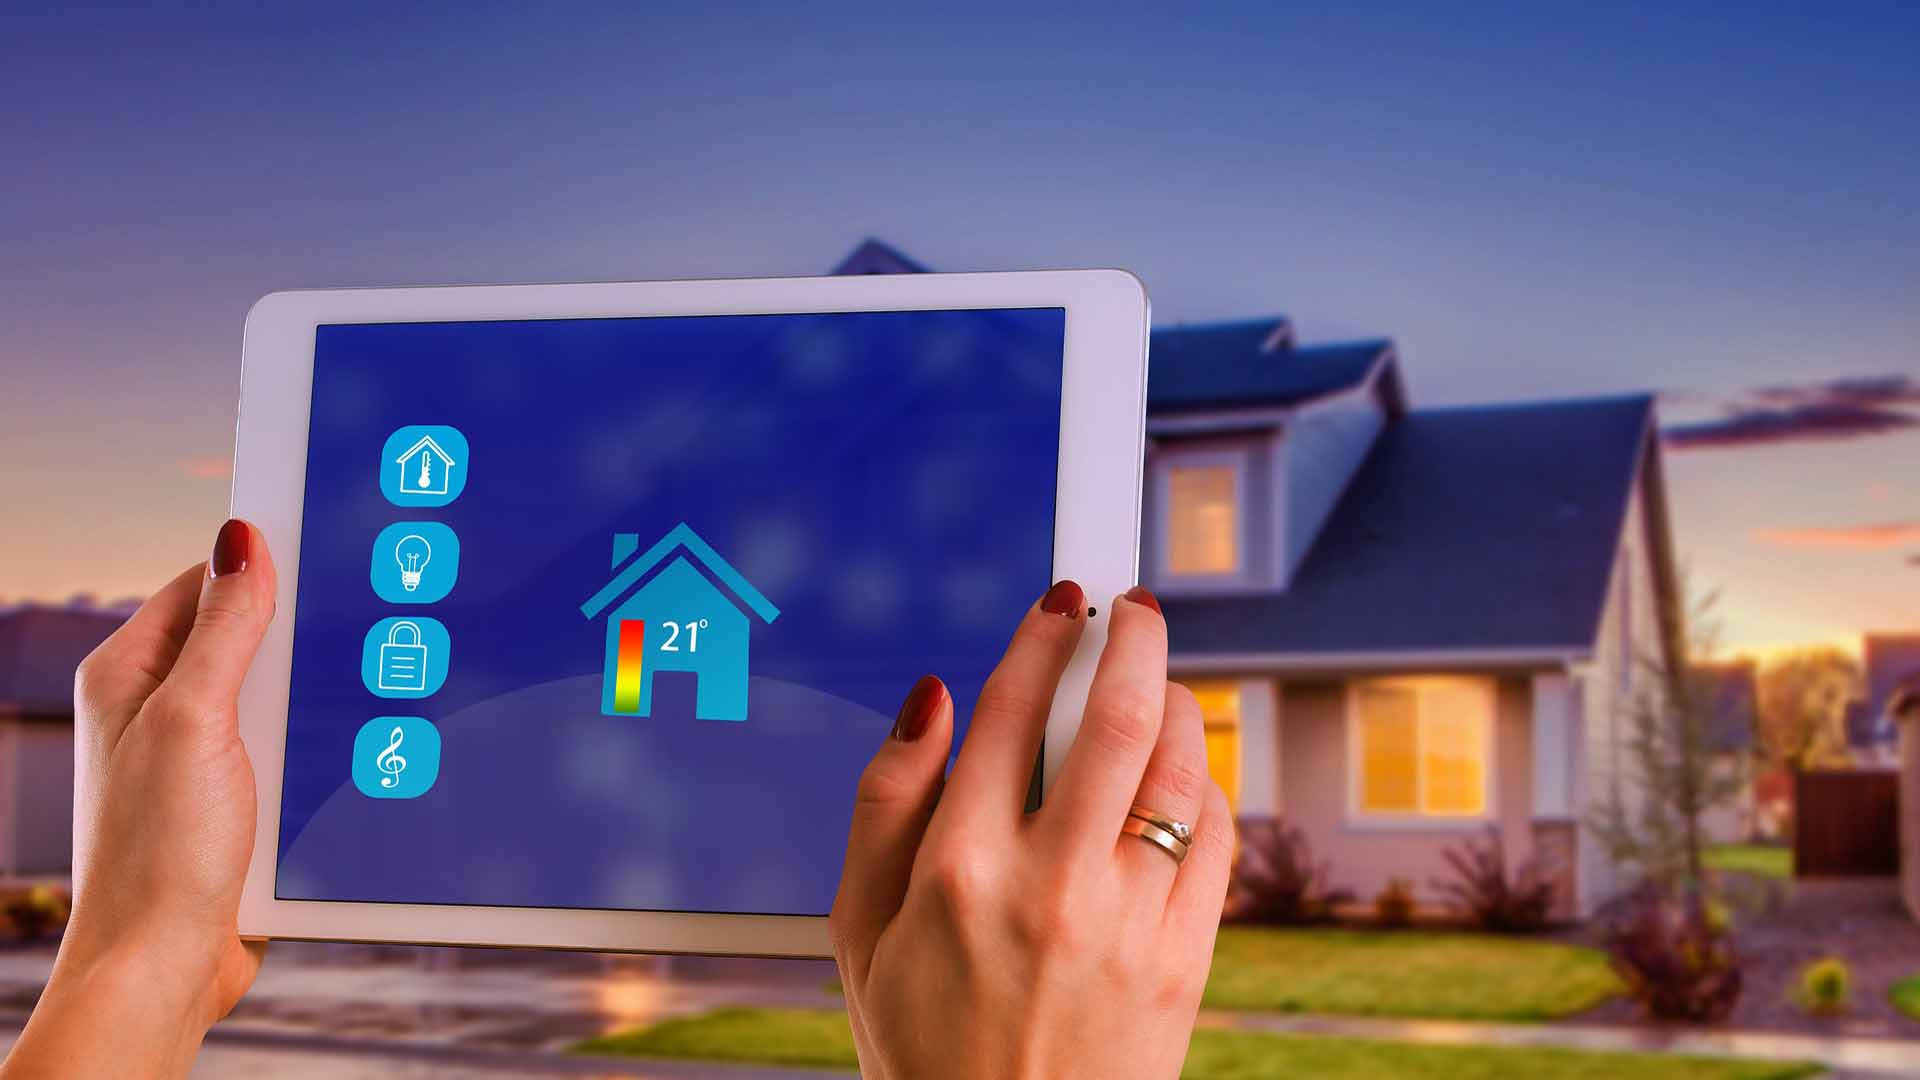 3 Money Saving Tips To Create A Smart Home On A Budget